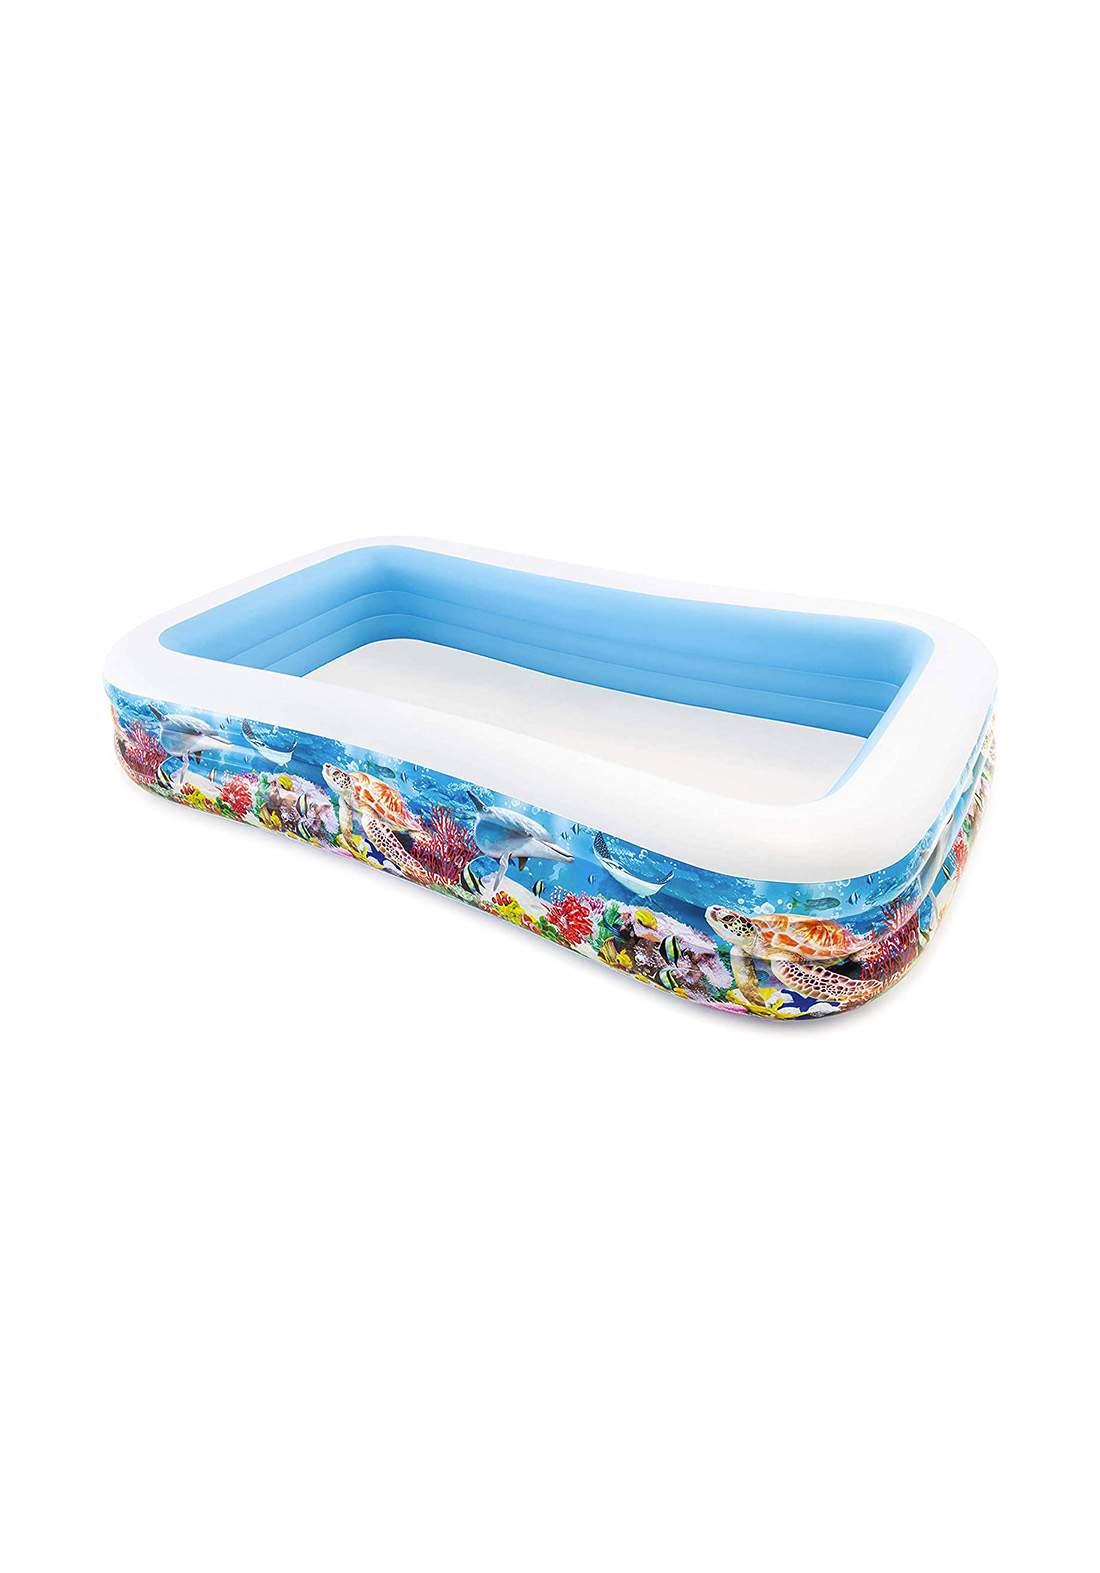 Intex 58485 Inflatable Pool Swimming Center Happy Fish Family Pool مسبح